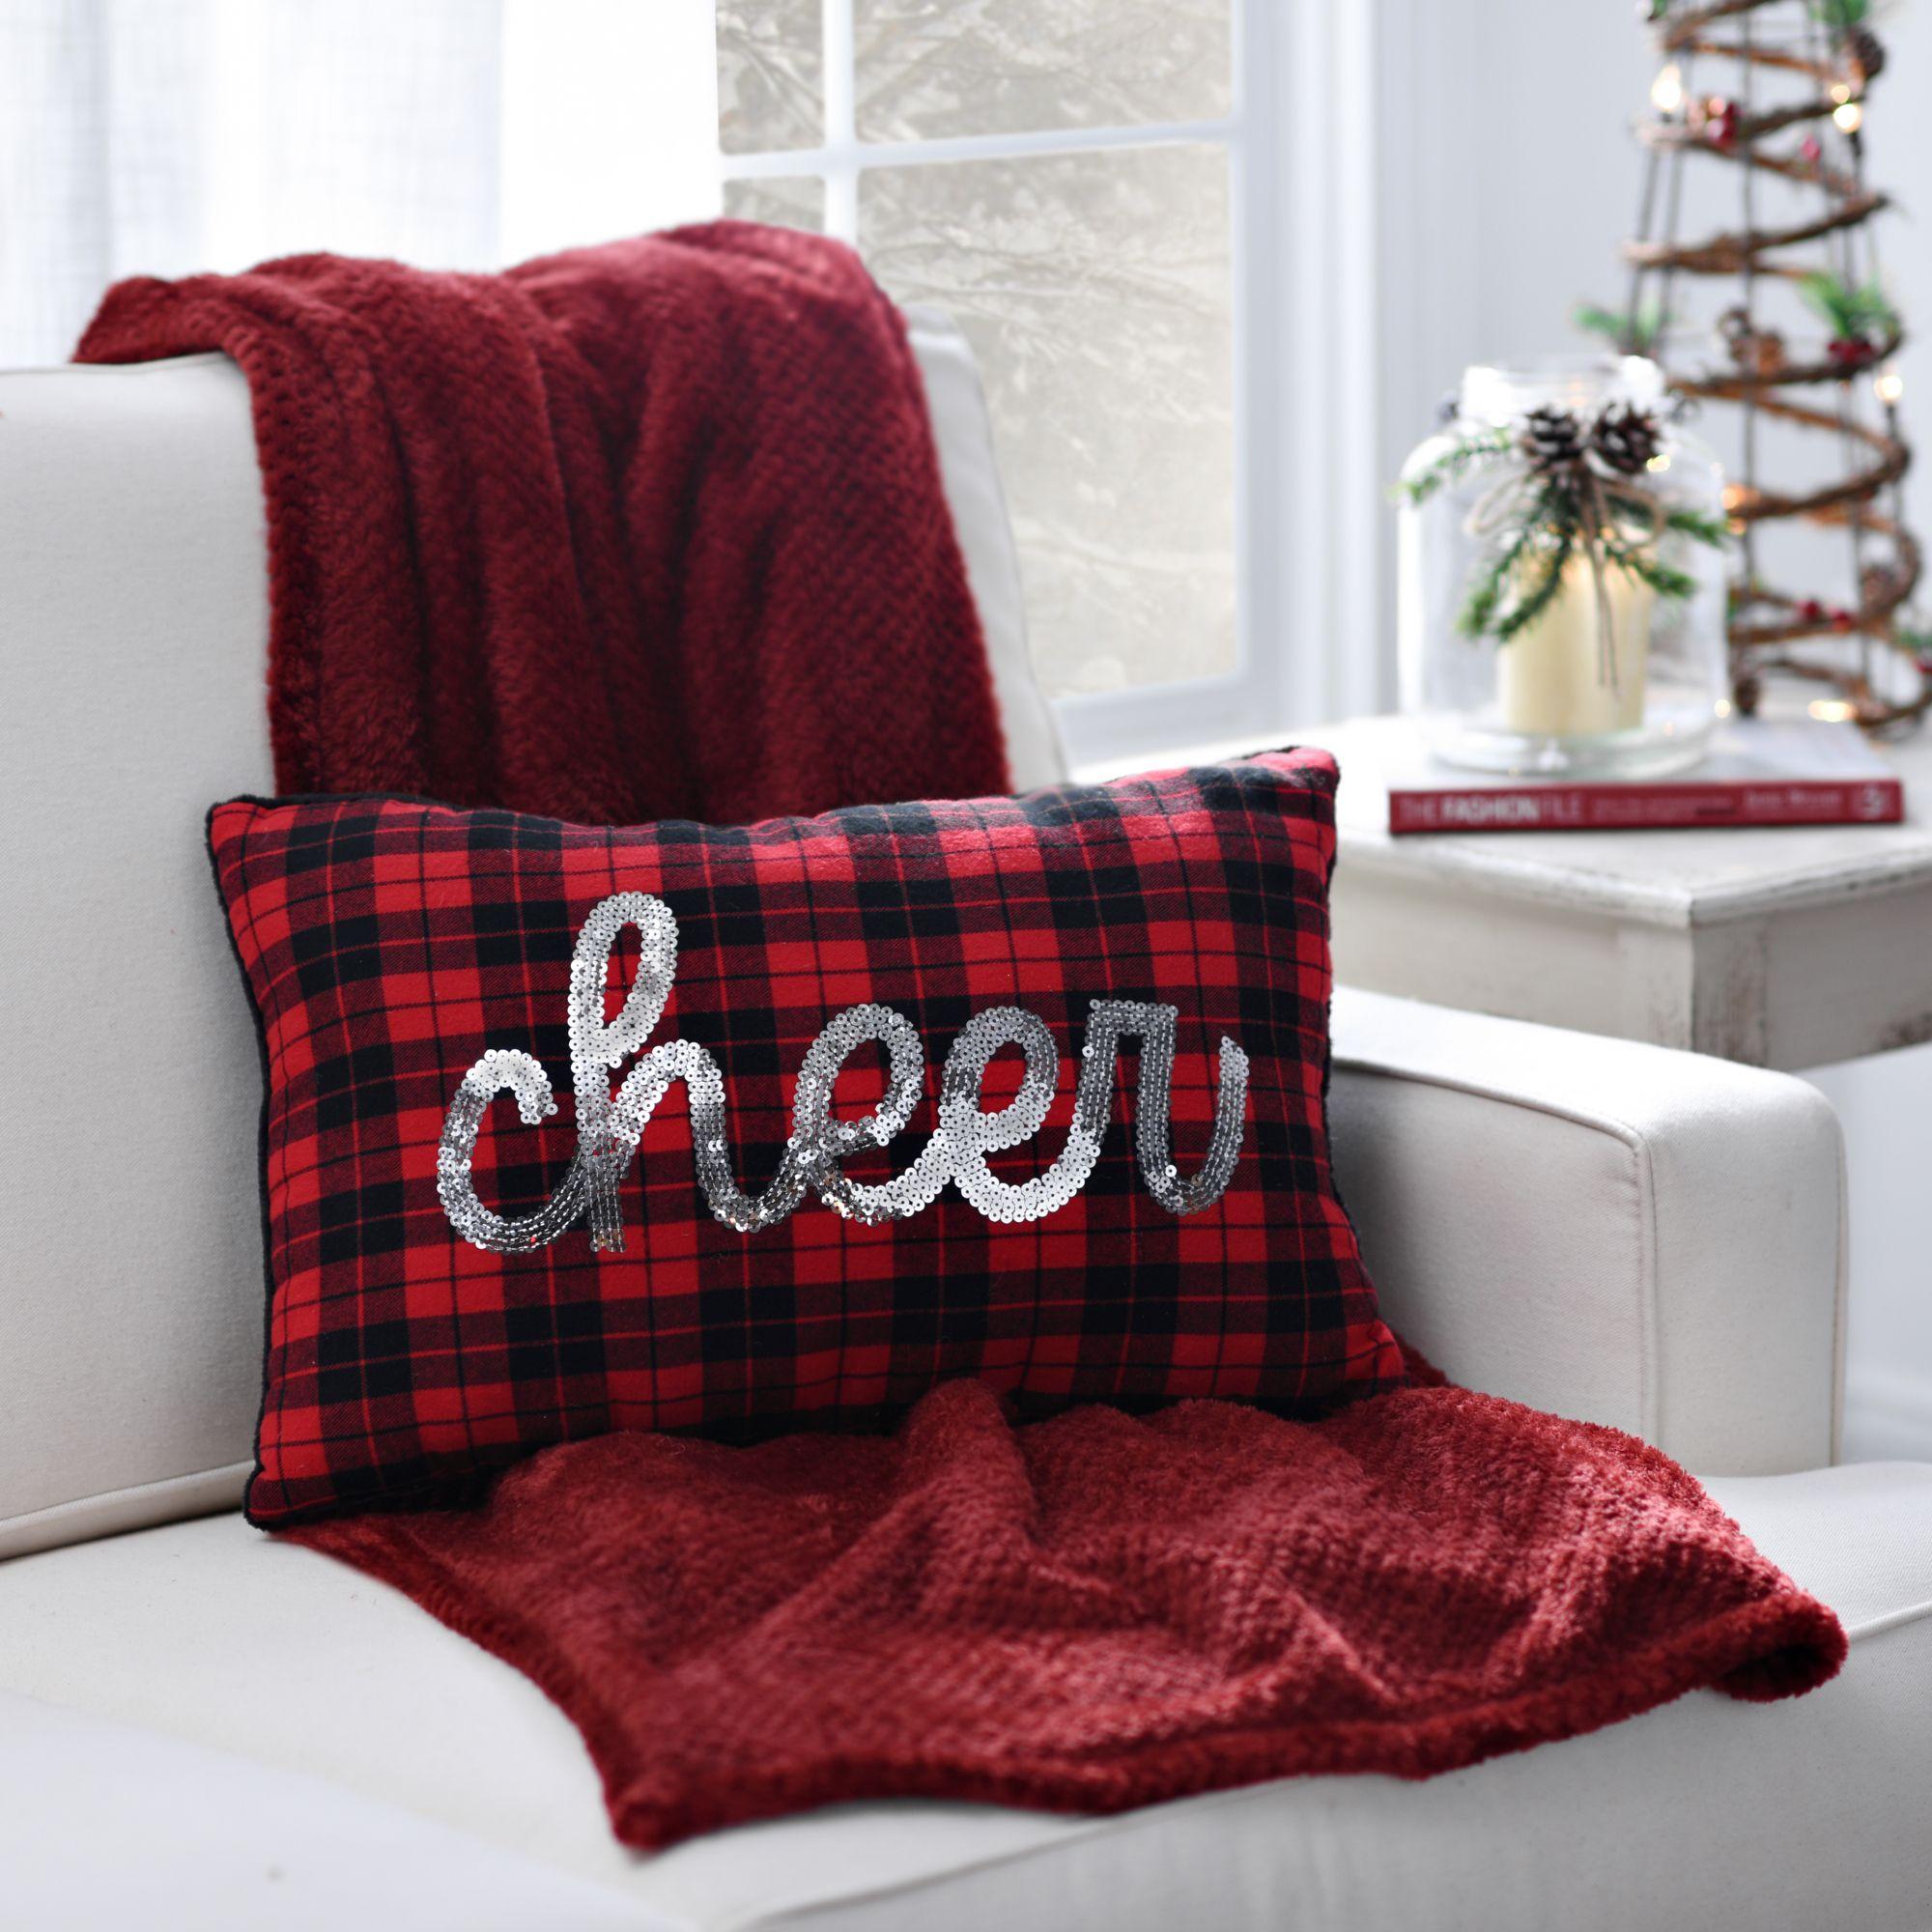 Plaid sequin cheer pillow cheer plaid and pillows